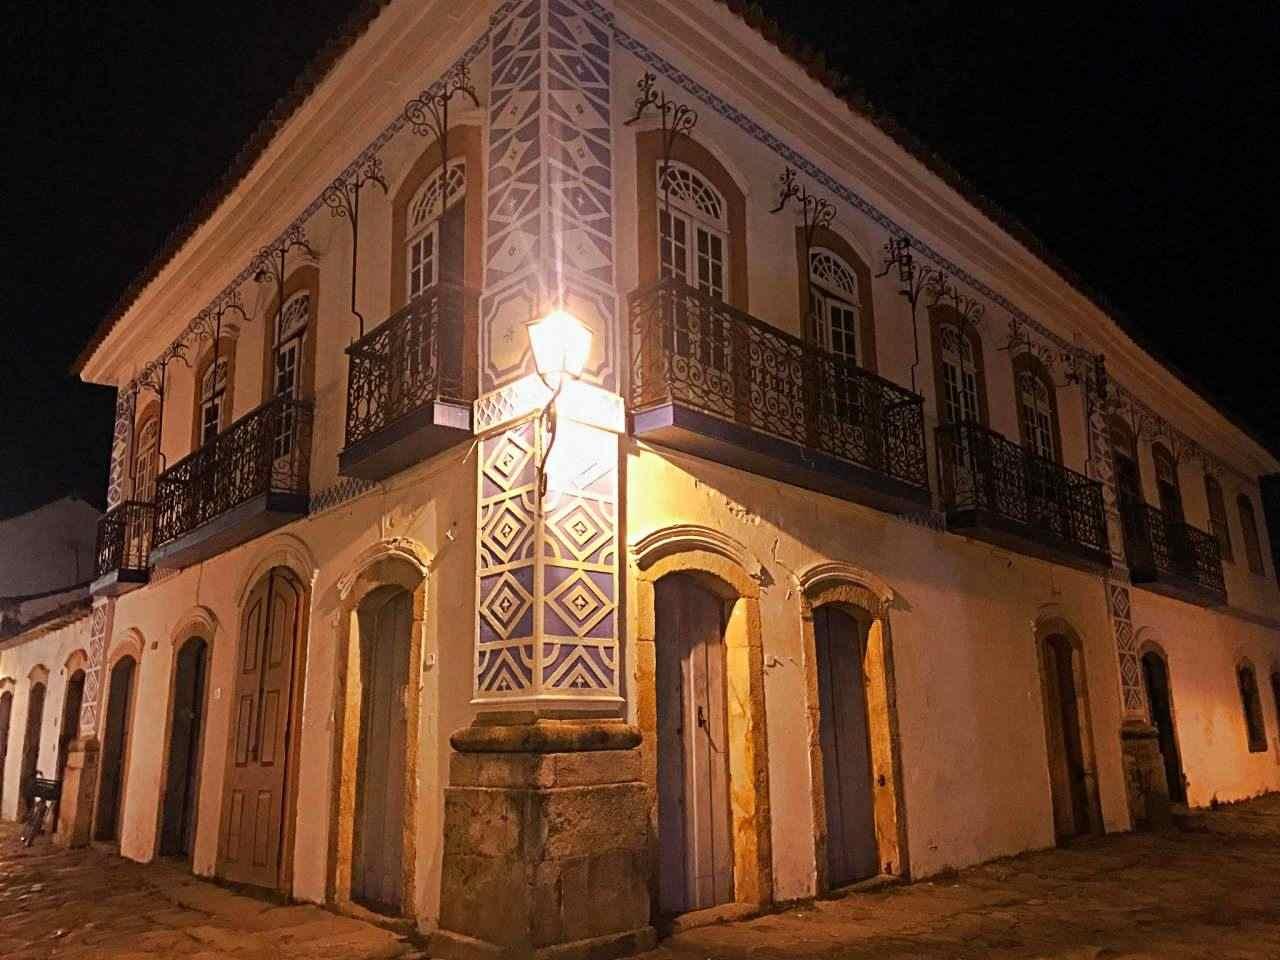 Casa Colonial, símbolos maçônicos